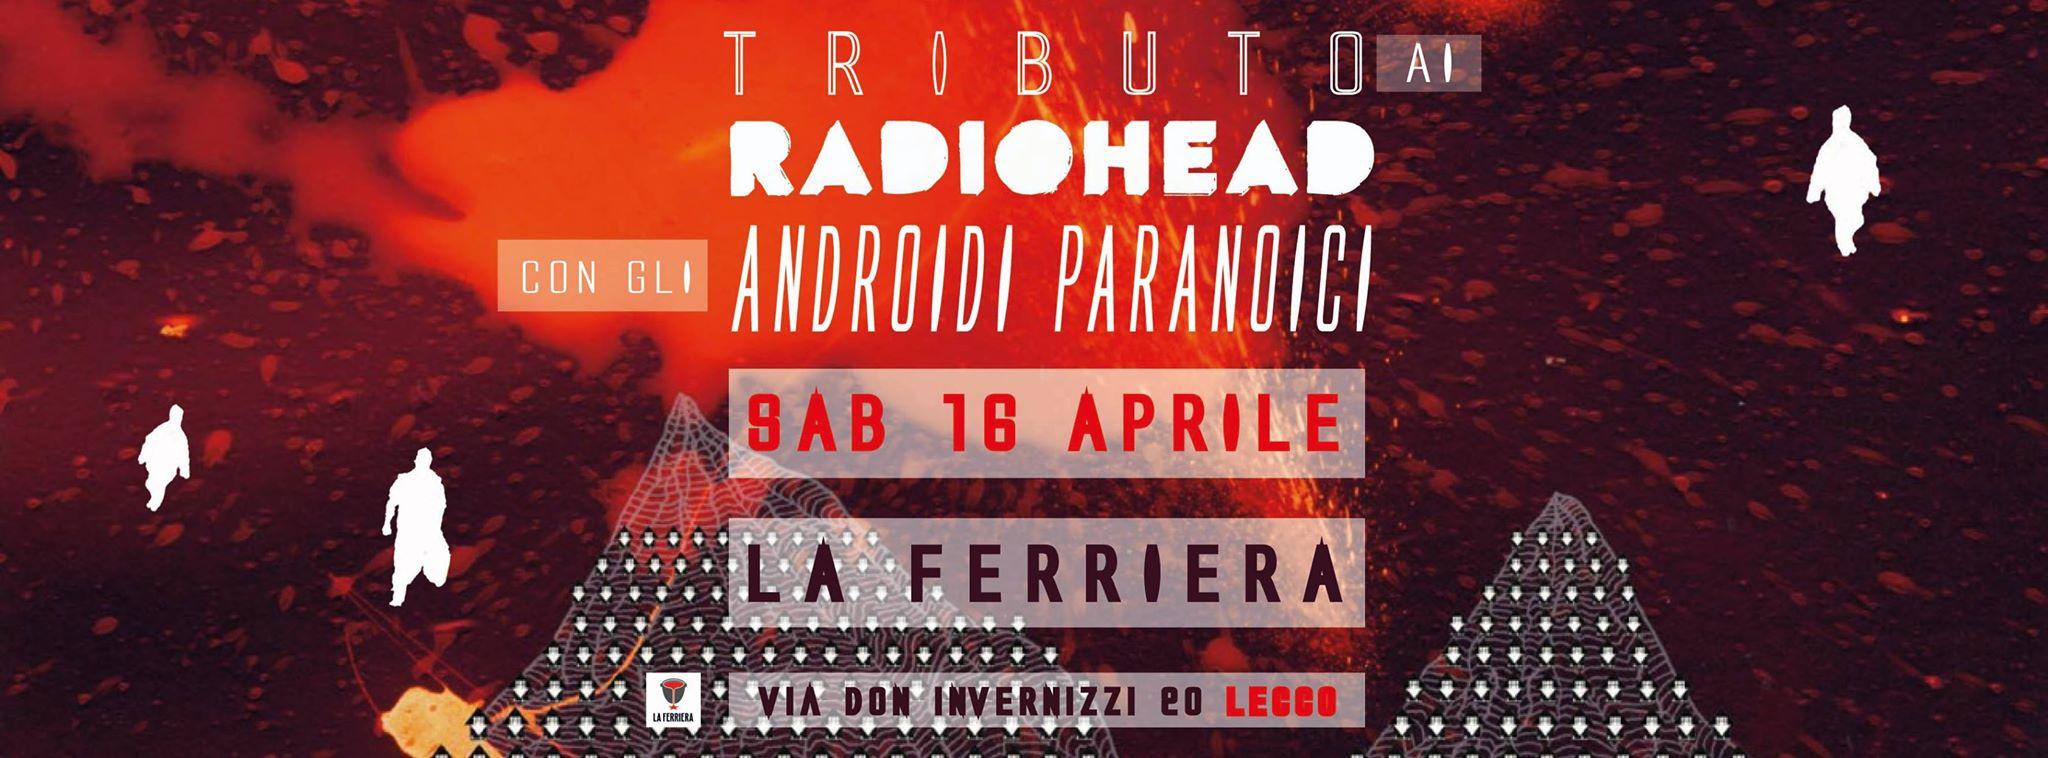 Omaggio ai Radiohead